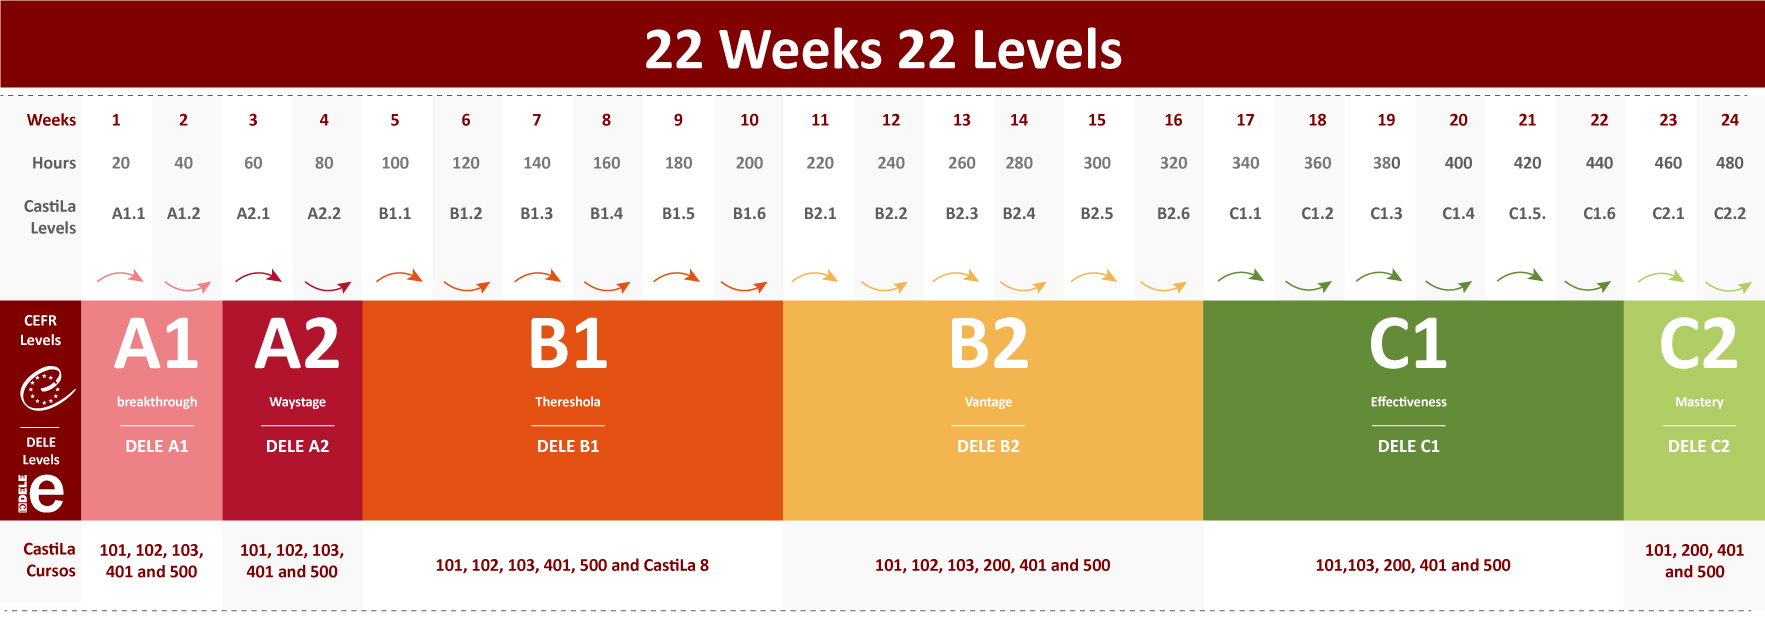 22 week 22 levels